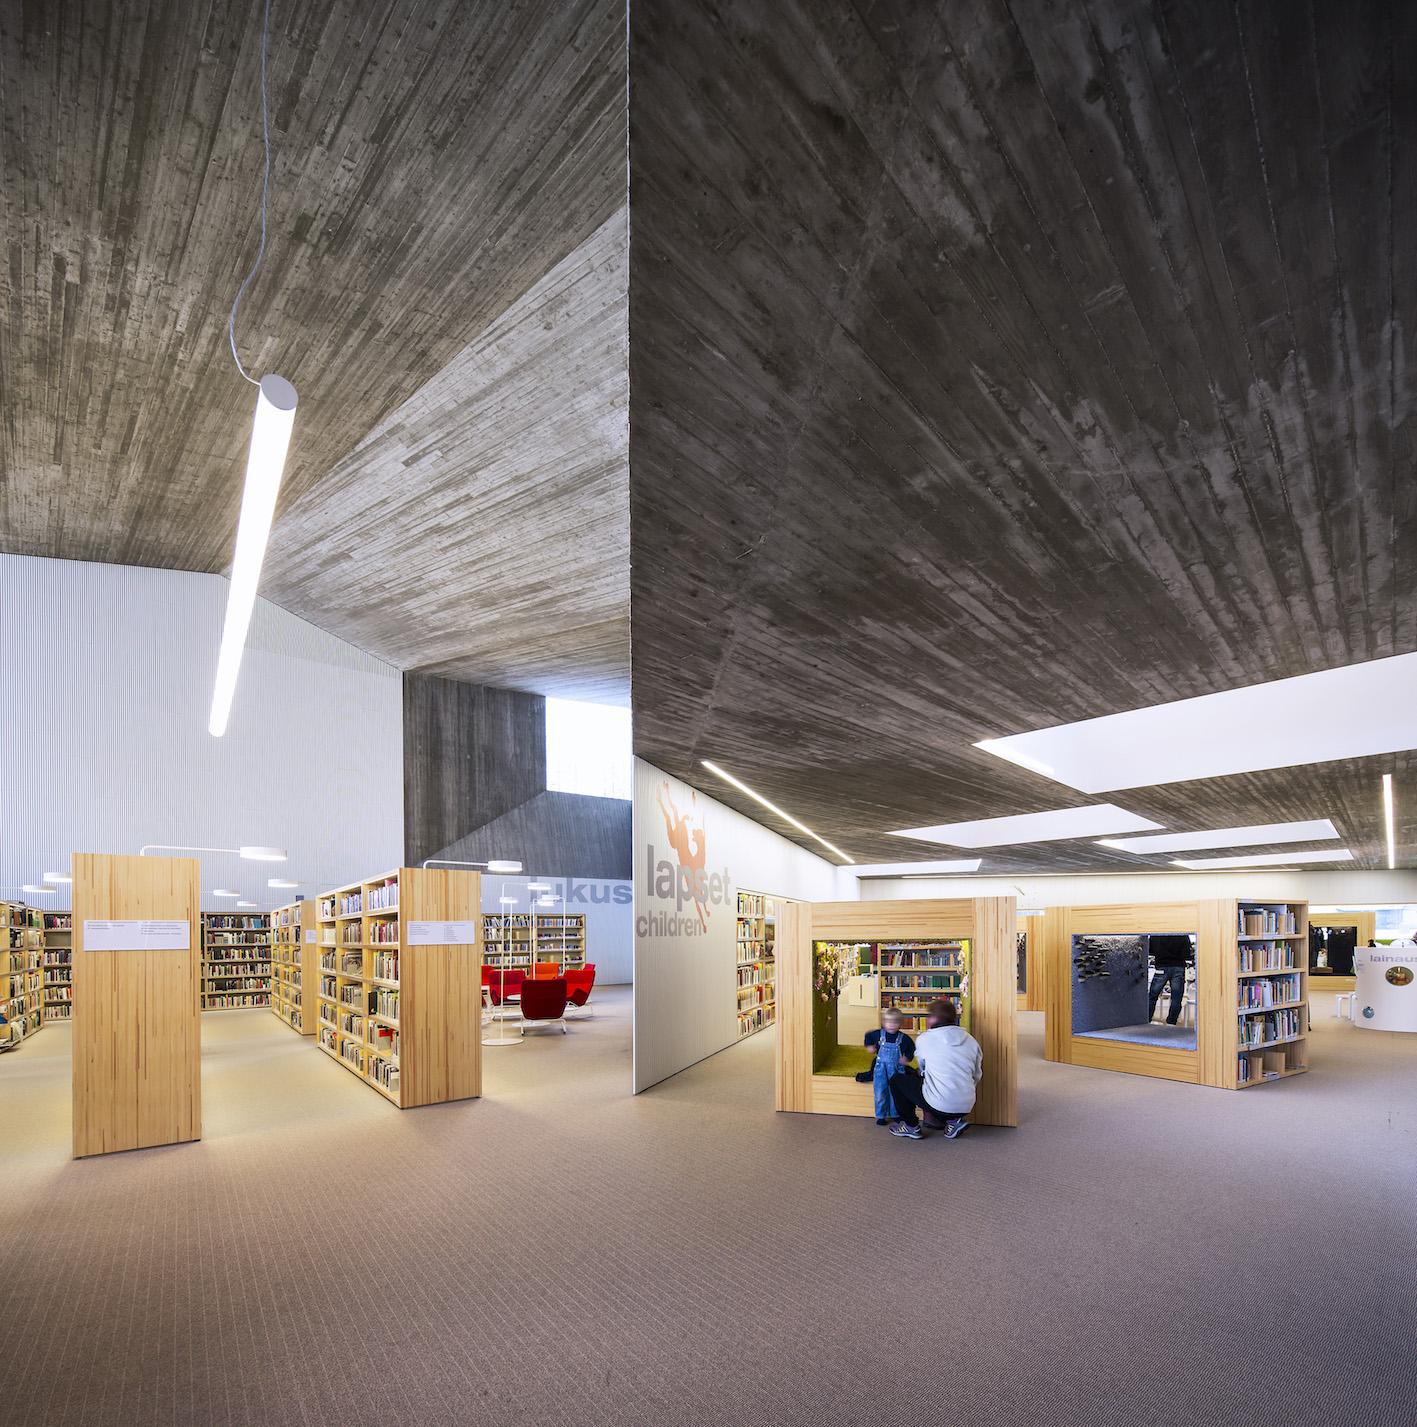 Project team for the Swiss Pavilion at the 2018 Venice Architecture Biennale, 1 December 2017. Left to right, Ani Vihervaara, Alessandro Bosshard, Li Tavor and Matthew van der Ploeg. Photo by Christian Beutler KEY